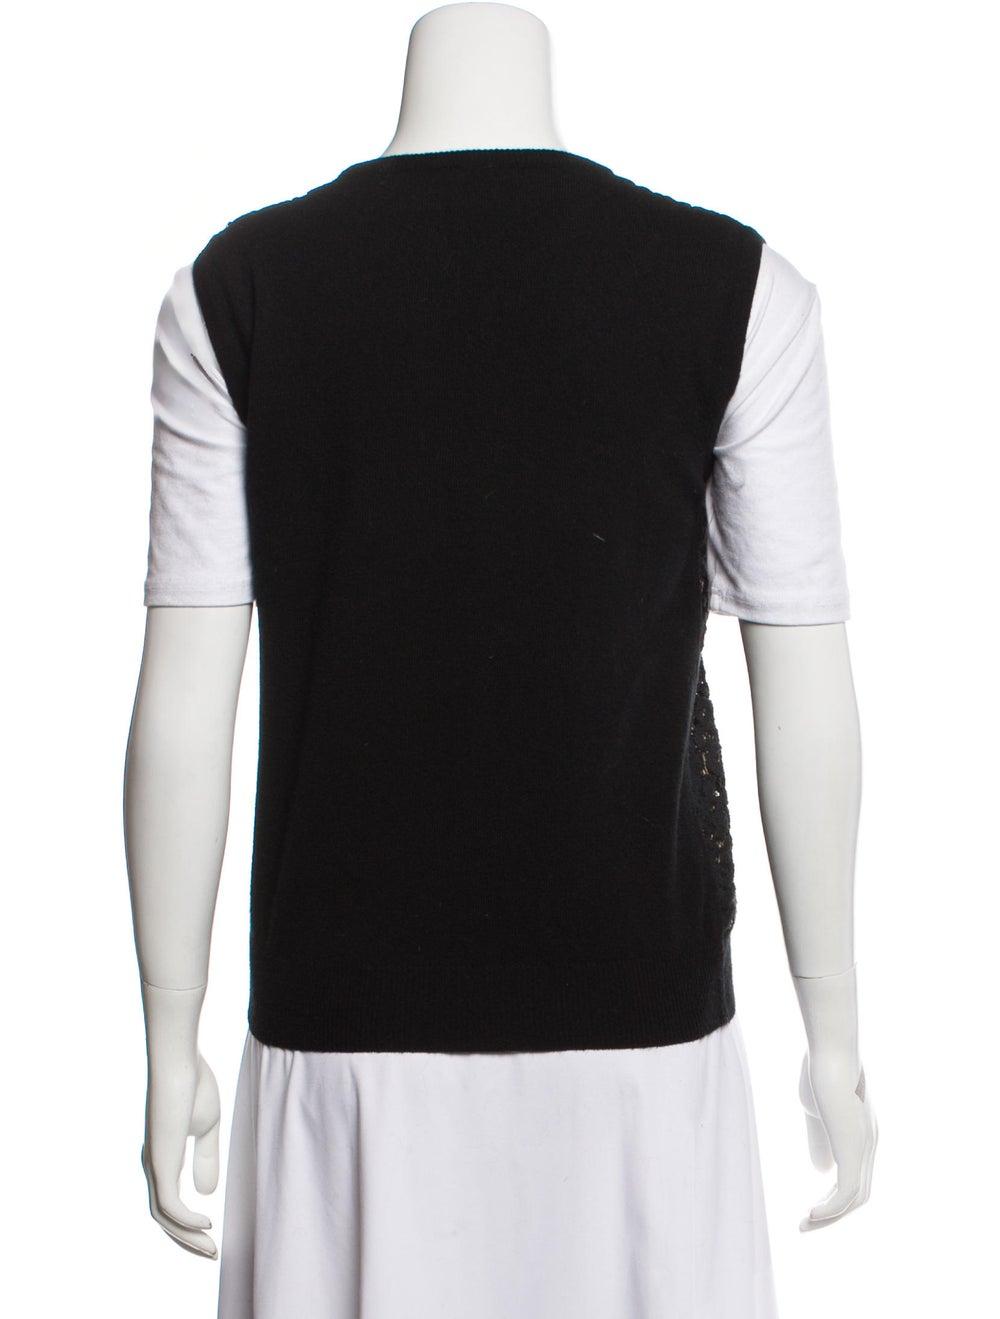 Chloé Wool & Cashmere-Blend Sweater Vest Black - image 3